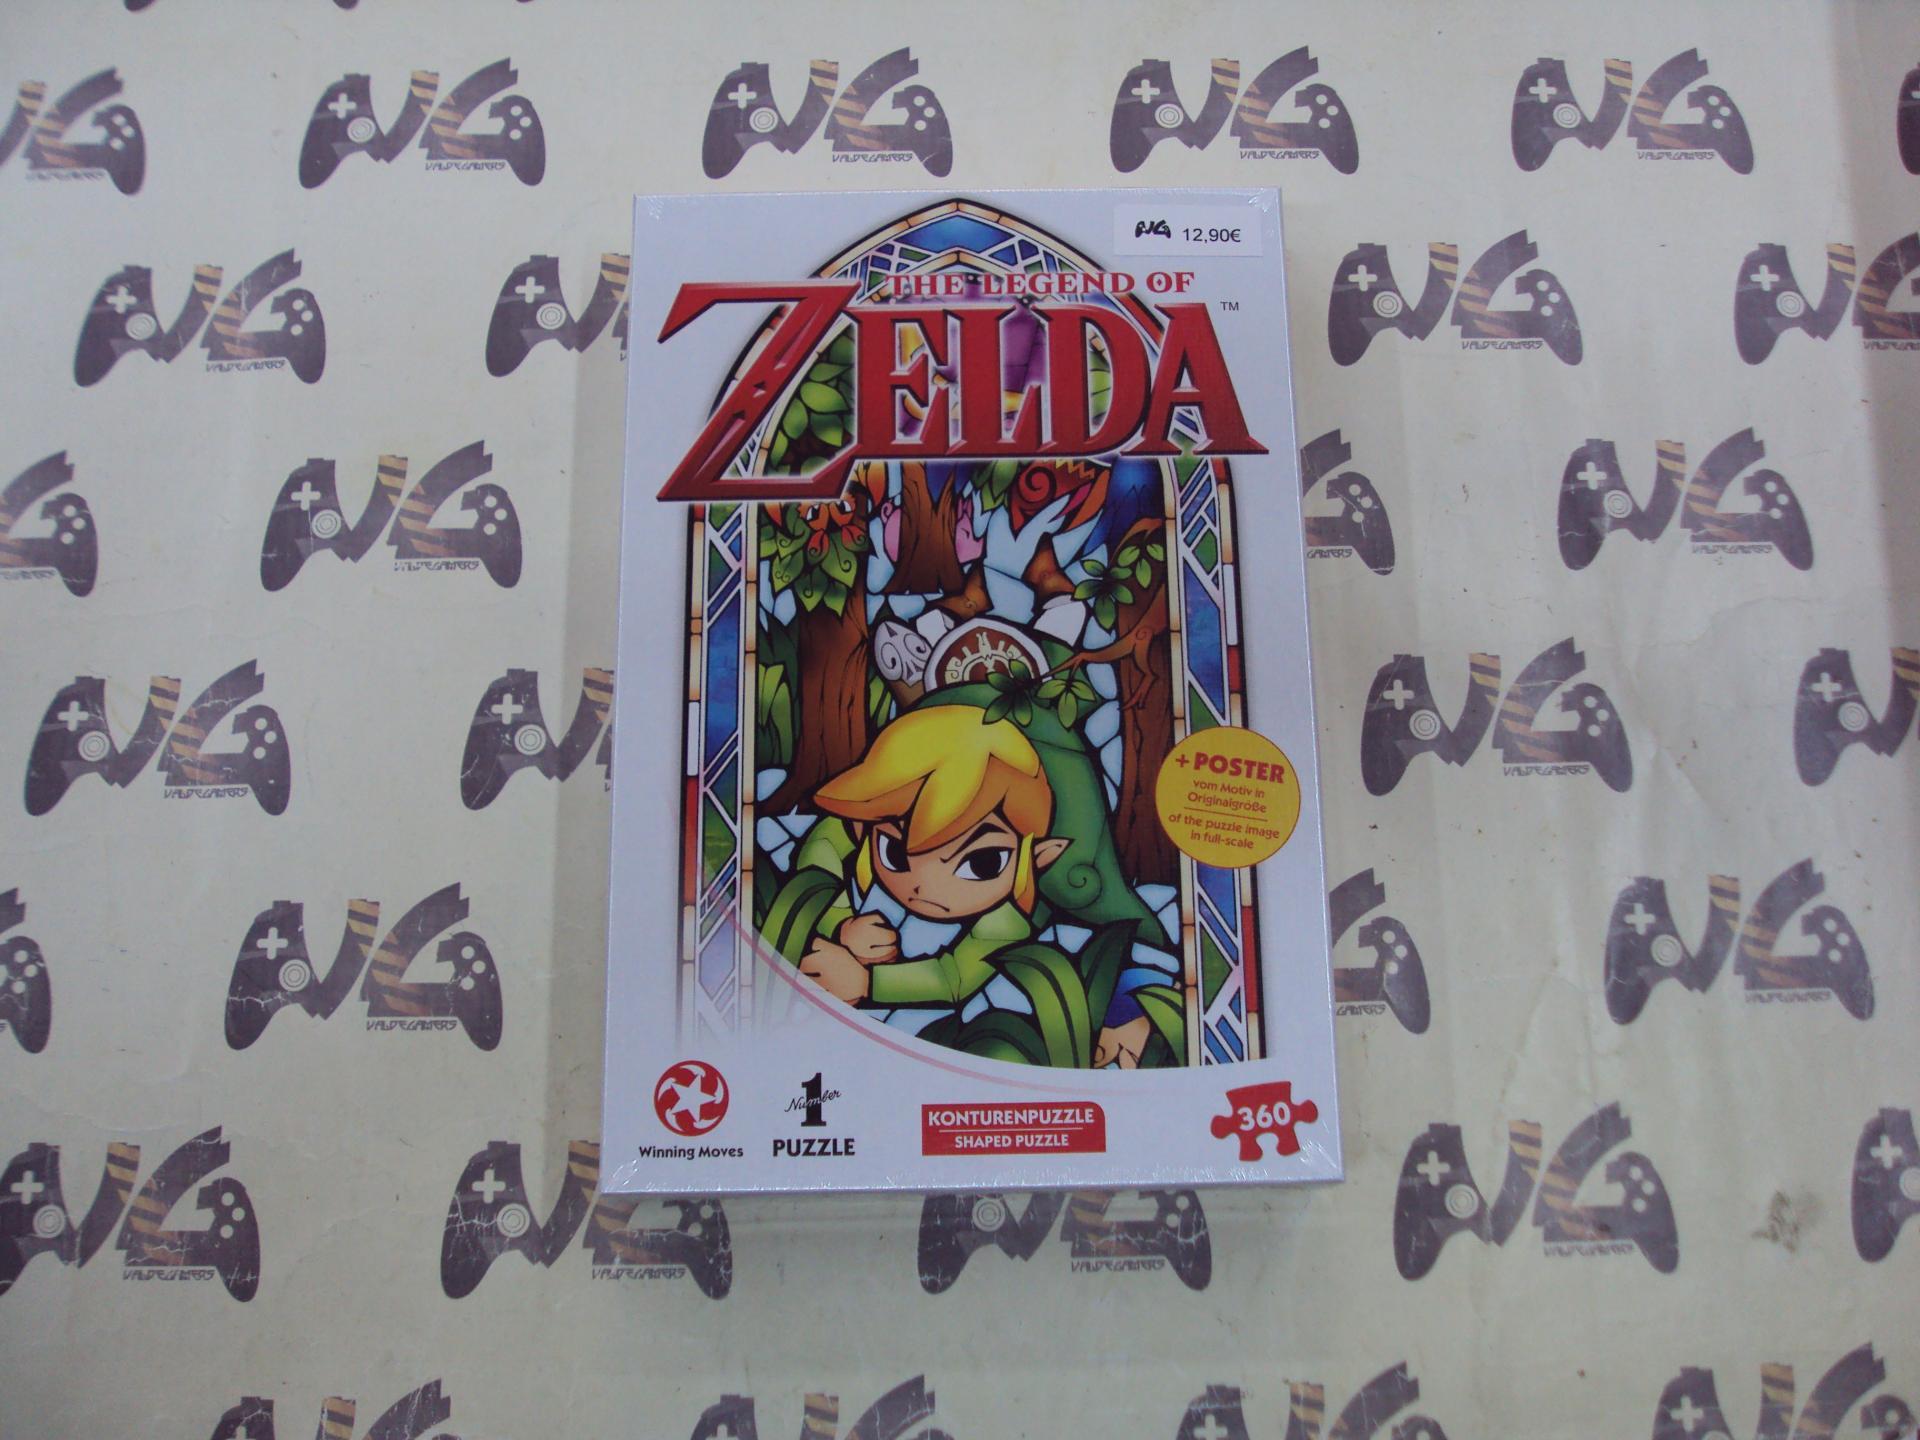 Puzzle The Legend of Zelda boomerang + poster